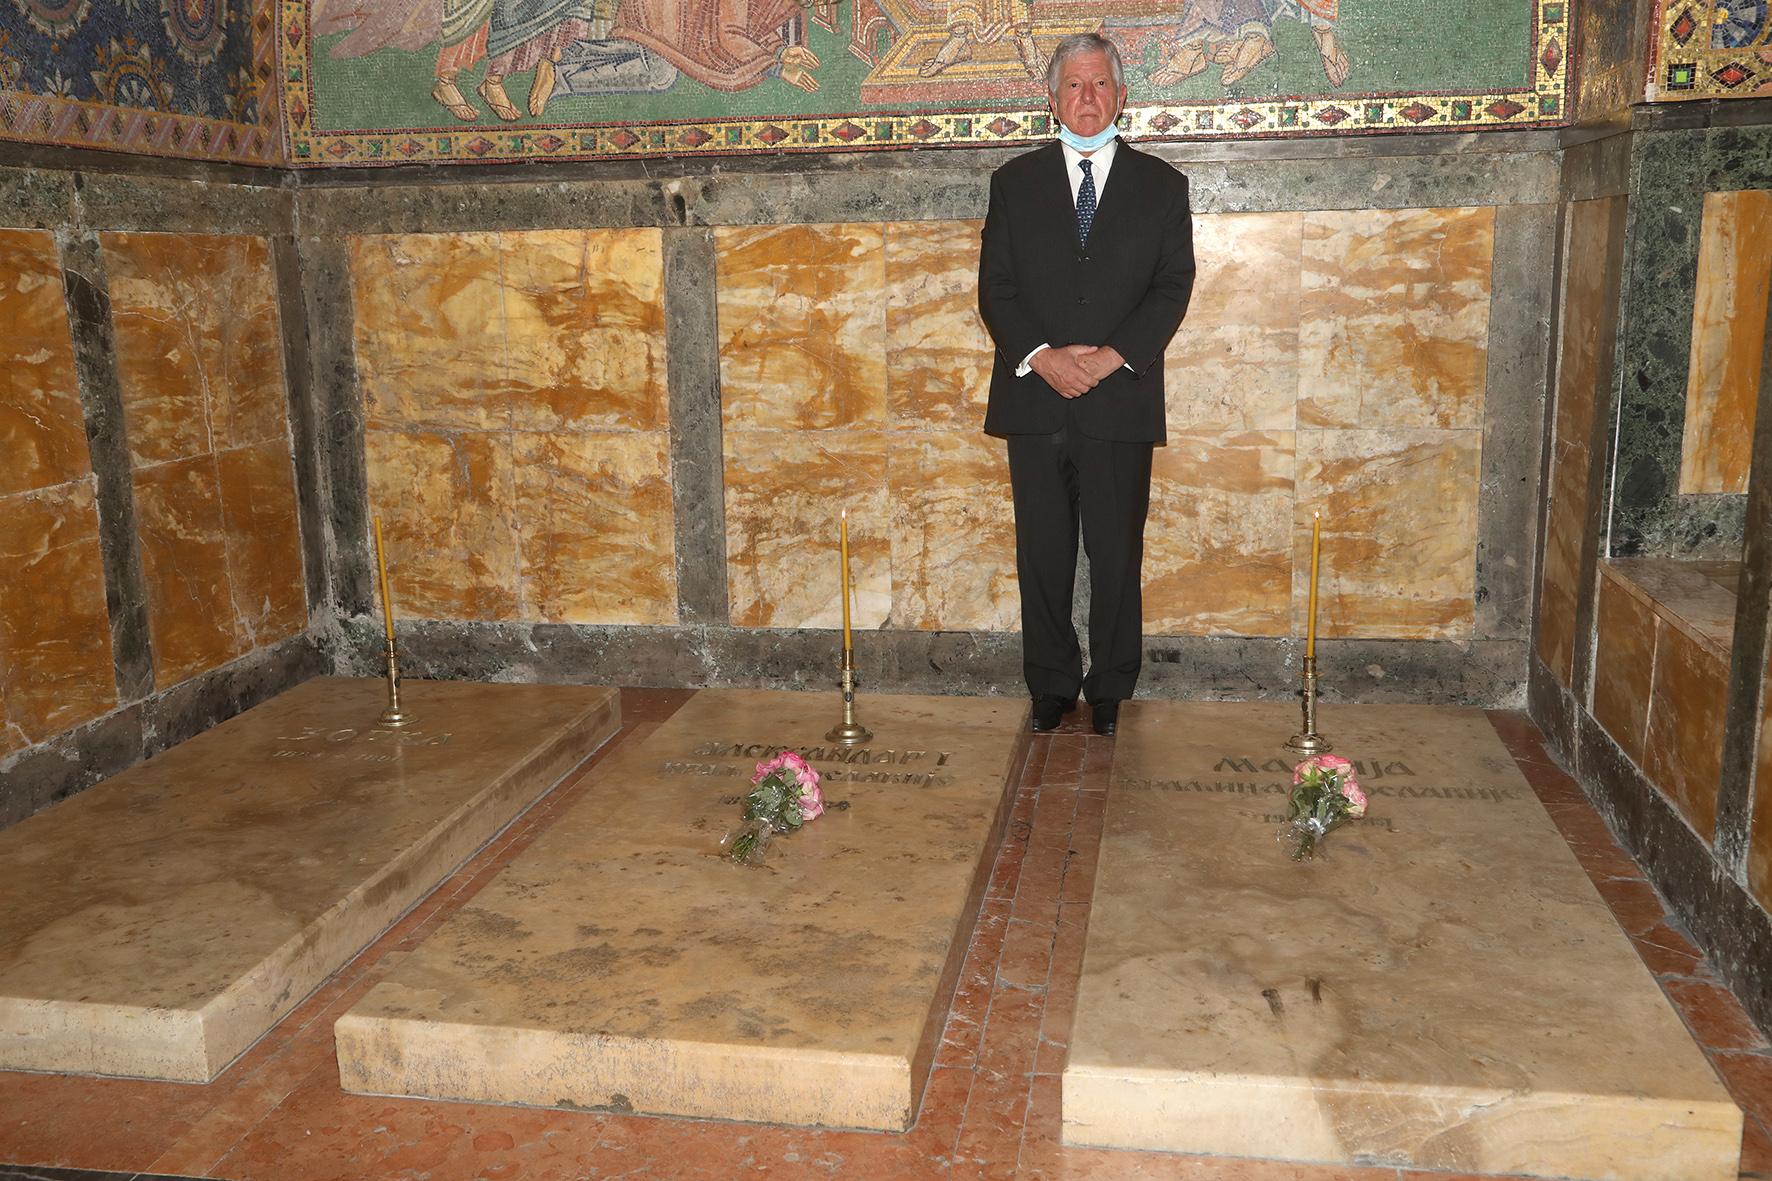 Nj.K.V. Prestolonaslednik Aleksandar pali sveće na grobovima njegovog dede, Nj.V. Kralja Aleksandra I i njegove bake, Nj.V. Kraljice Marije